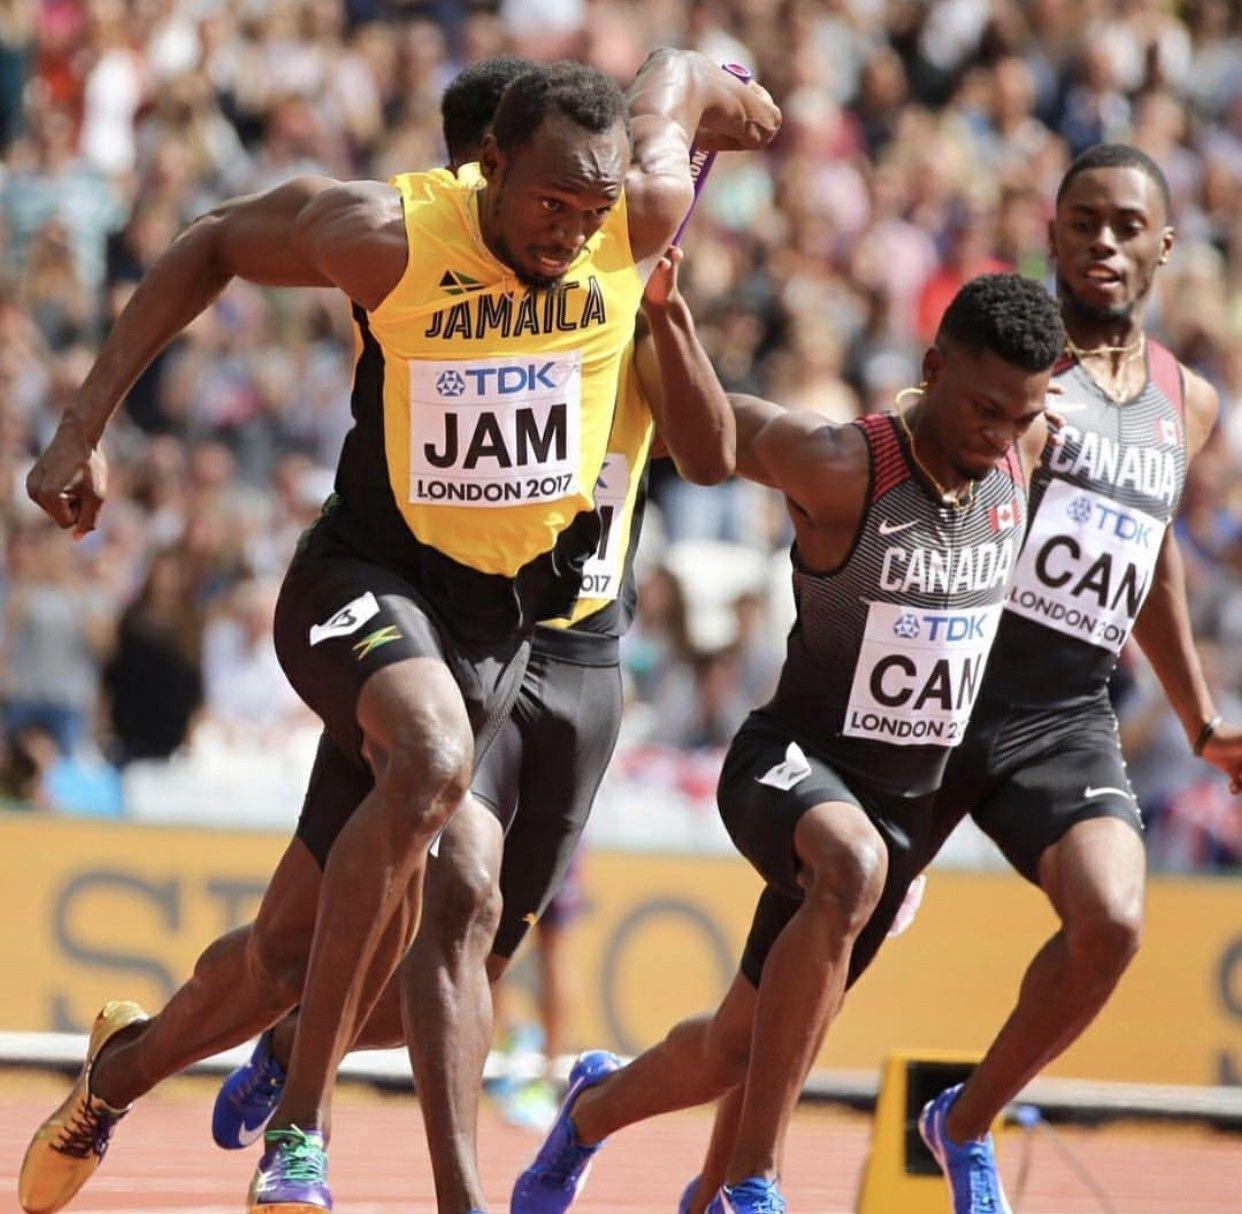 4X100M 2017 IAAF Men's World Track and Field Championships